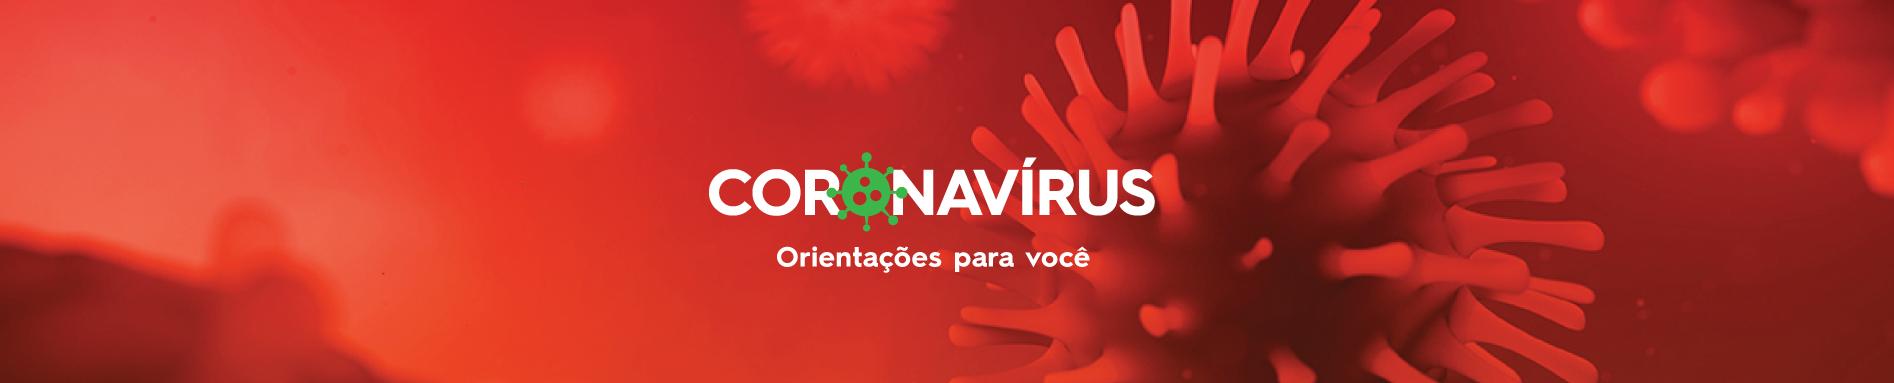 Coronavírus: Orientações para você